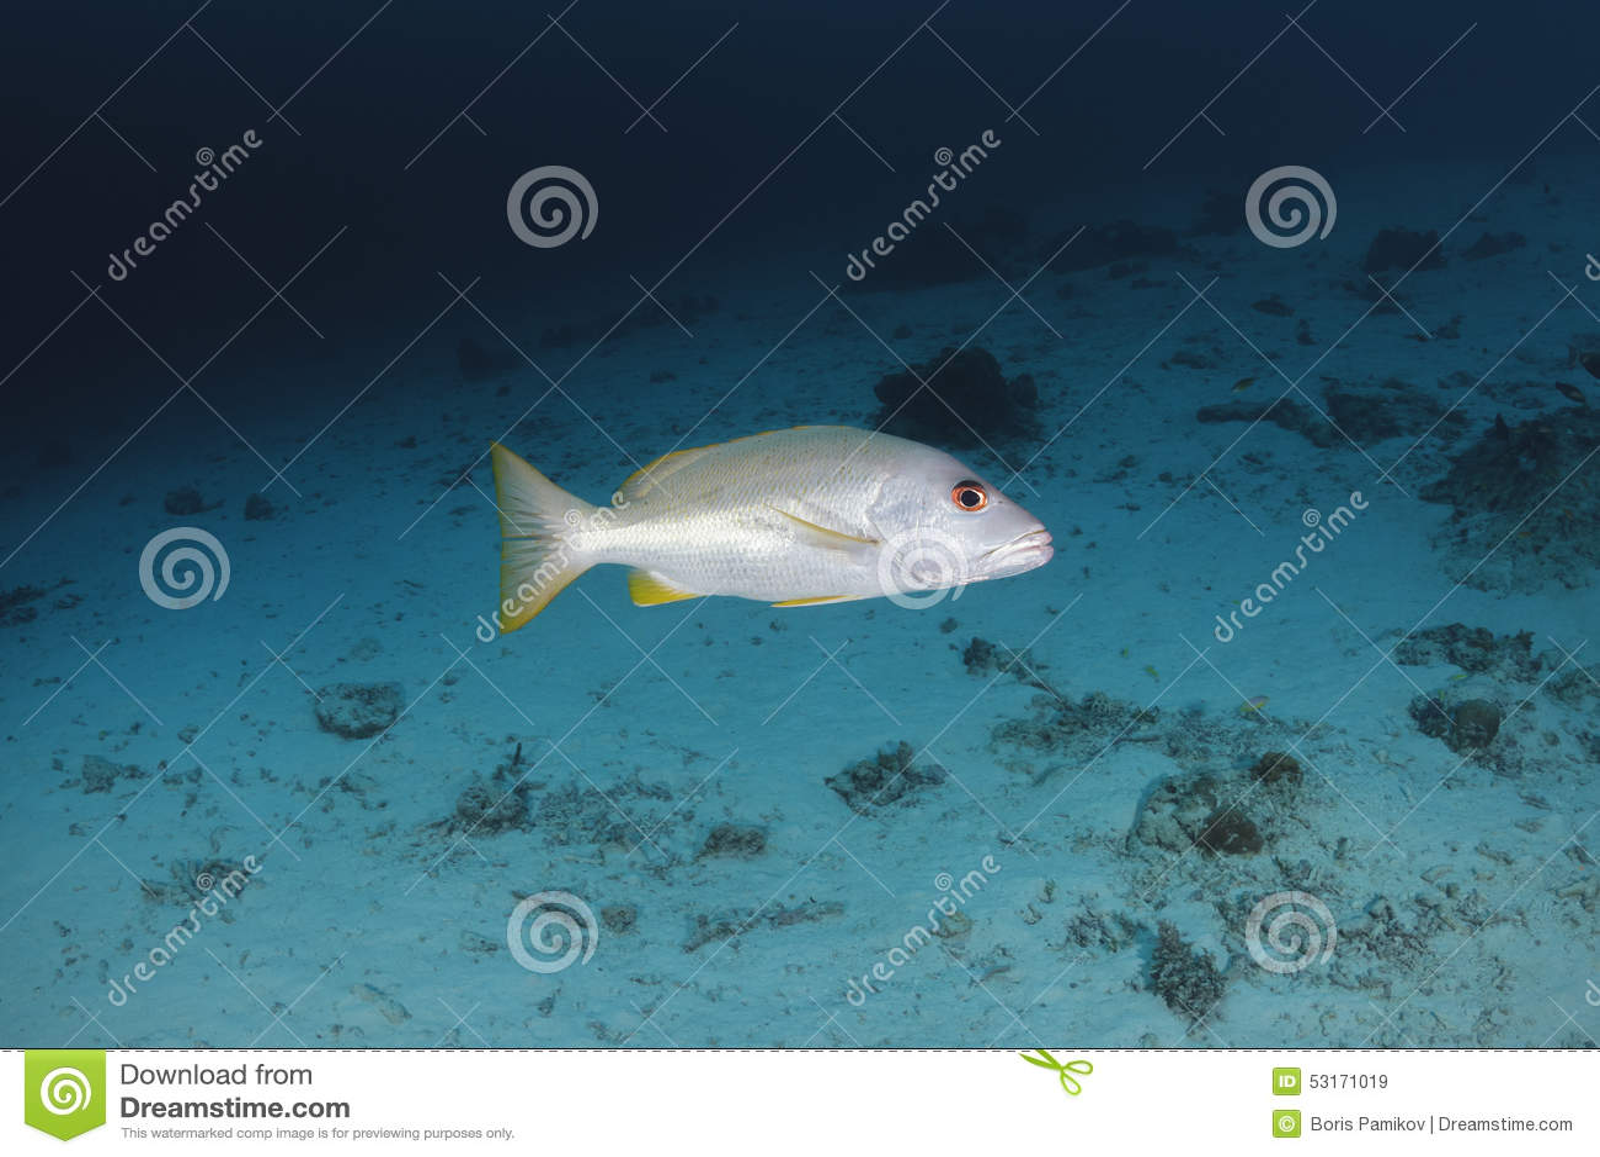 Onespot攫夺者swimm在安达曼海中,泰国水